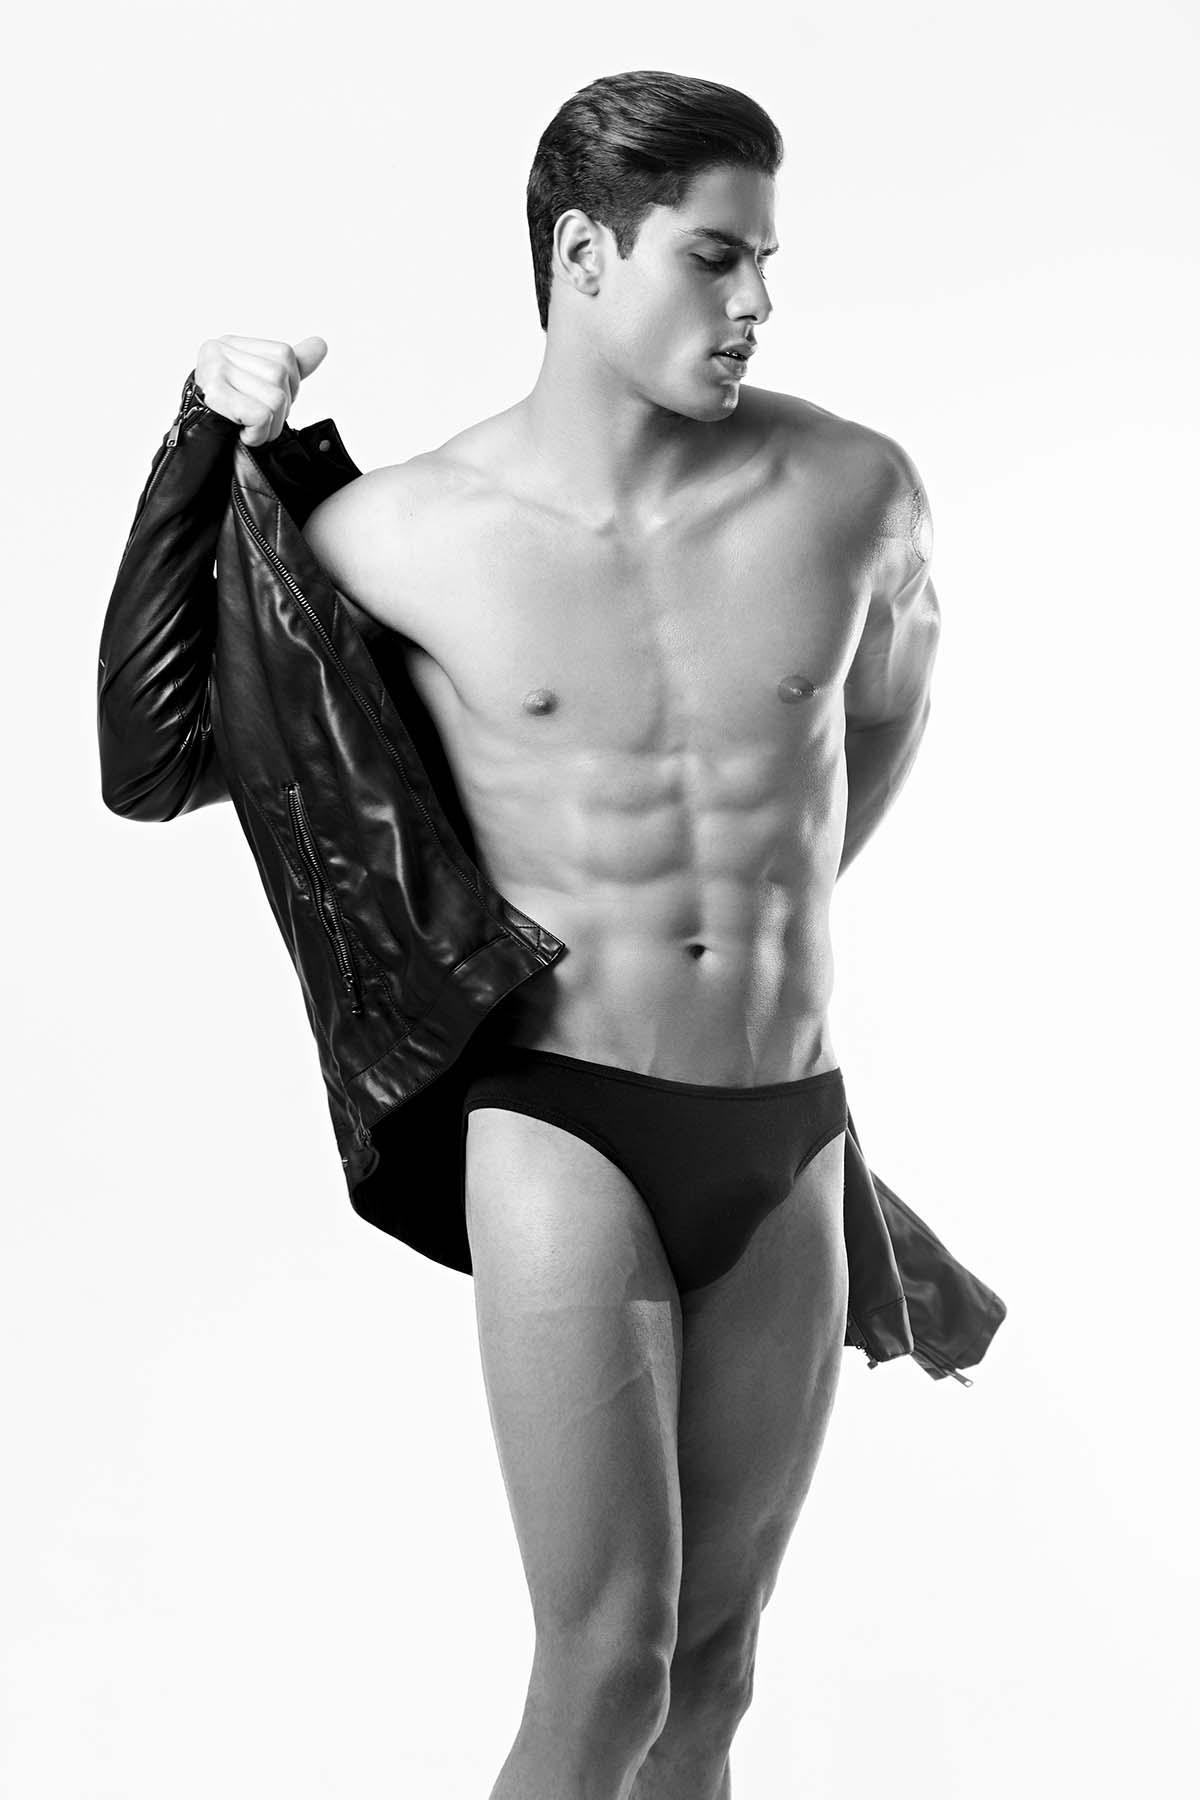 Hiago Paulino by Pedro Fonseca for Brazilian Male Model